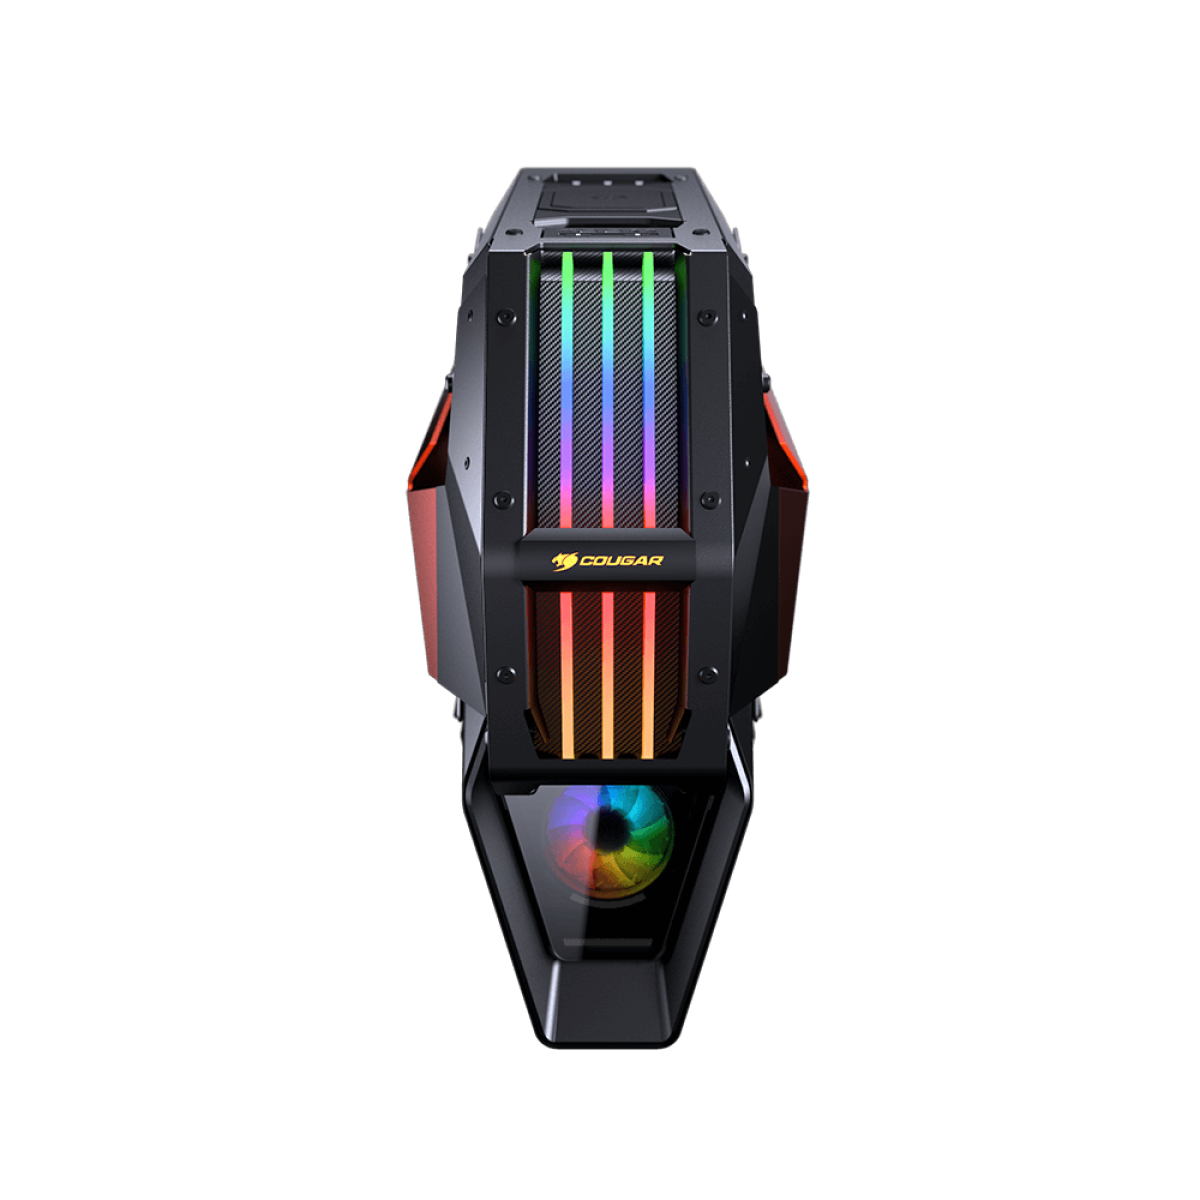 Gabinete Gamer Cougar Conquer 2, Full Tower, RGB, Vidro Temperado, Black/Orange, ATX, Sem Fonte, Com 1 Fan, 109CM10001-02